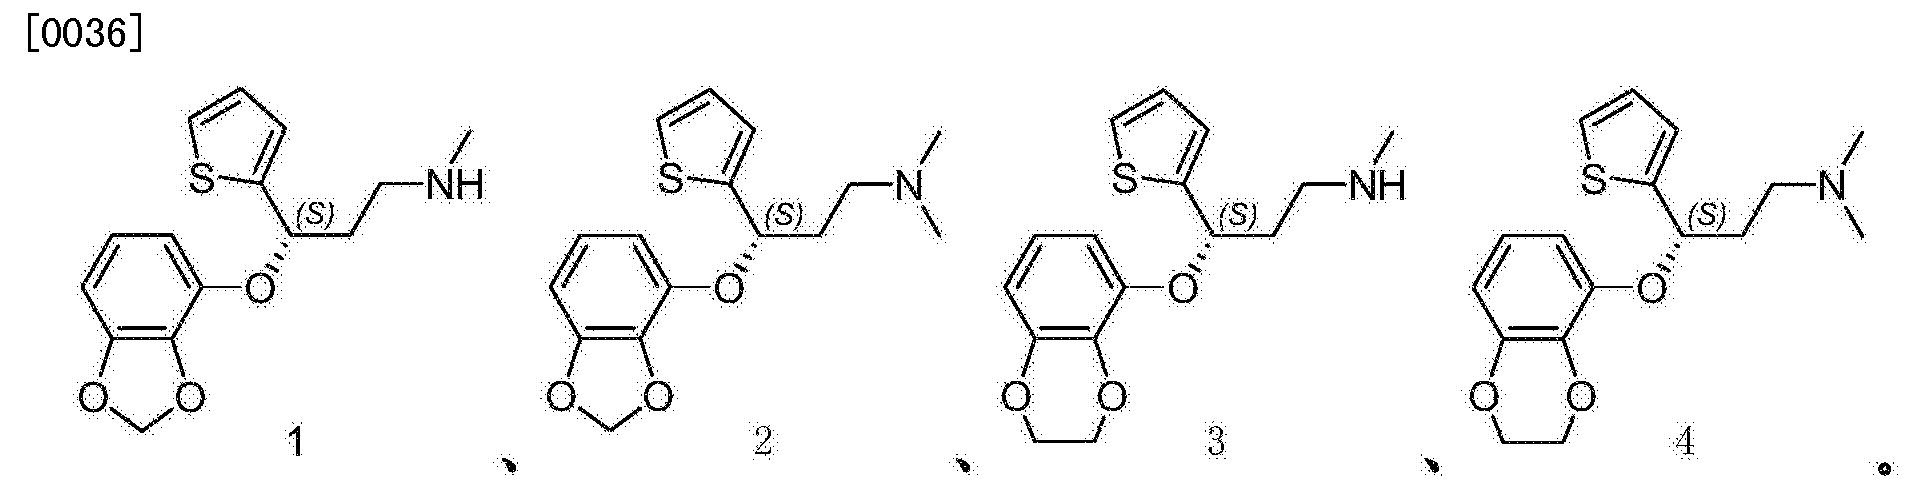 Figure CN105497020AD00052